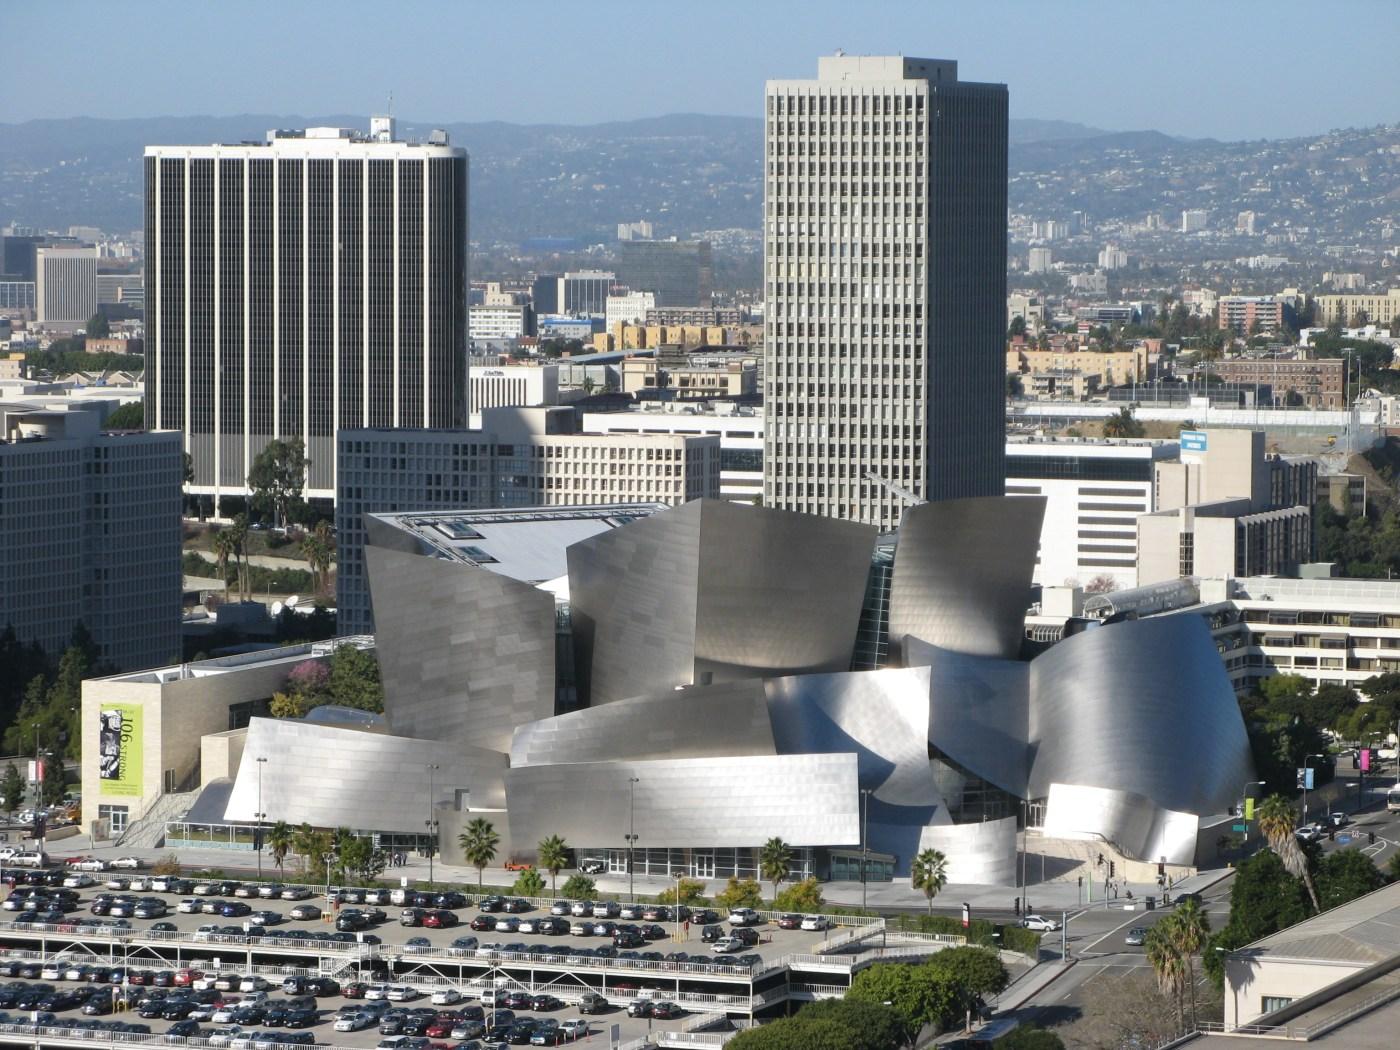 Walt_Disney_Concert_Hall_and_surrounding_area